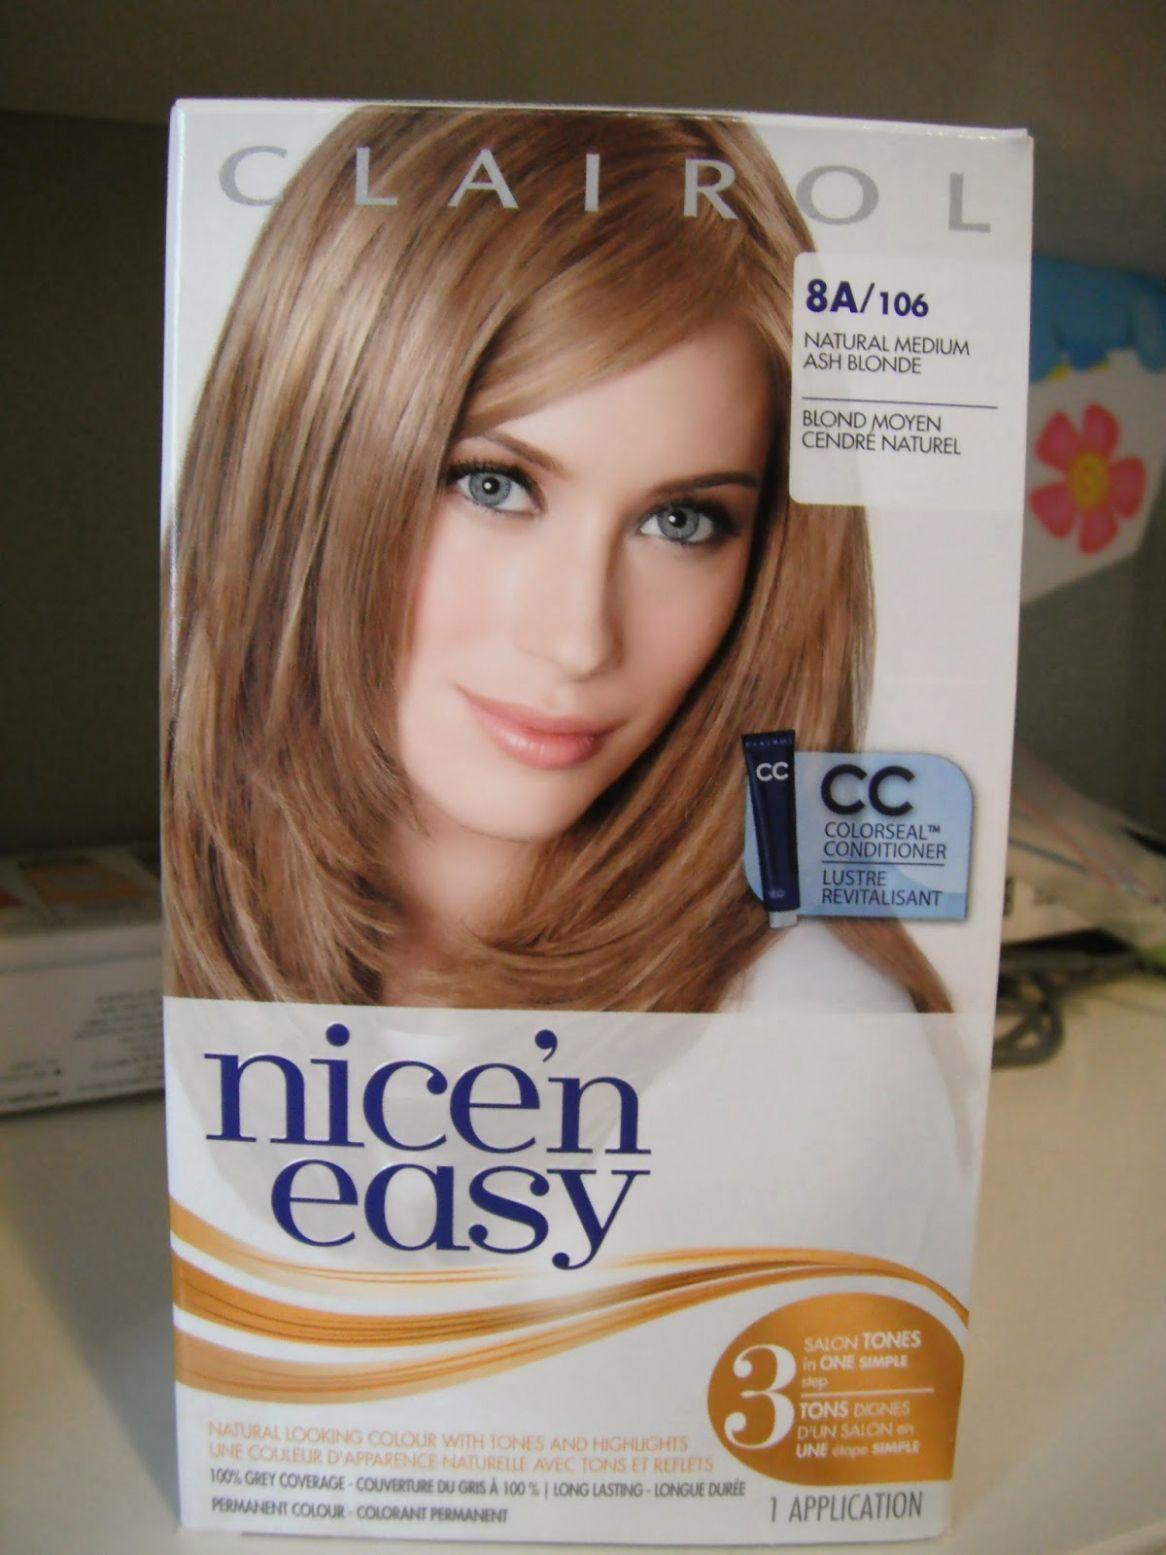 Pin by jooana on hair color ideas | Pinterest | Hair, Hair Color and ...